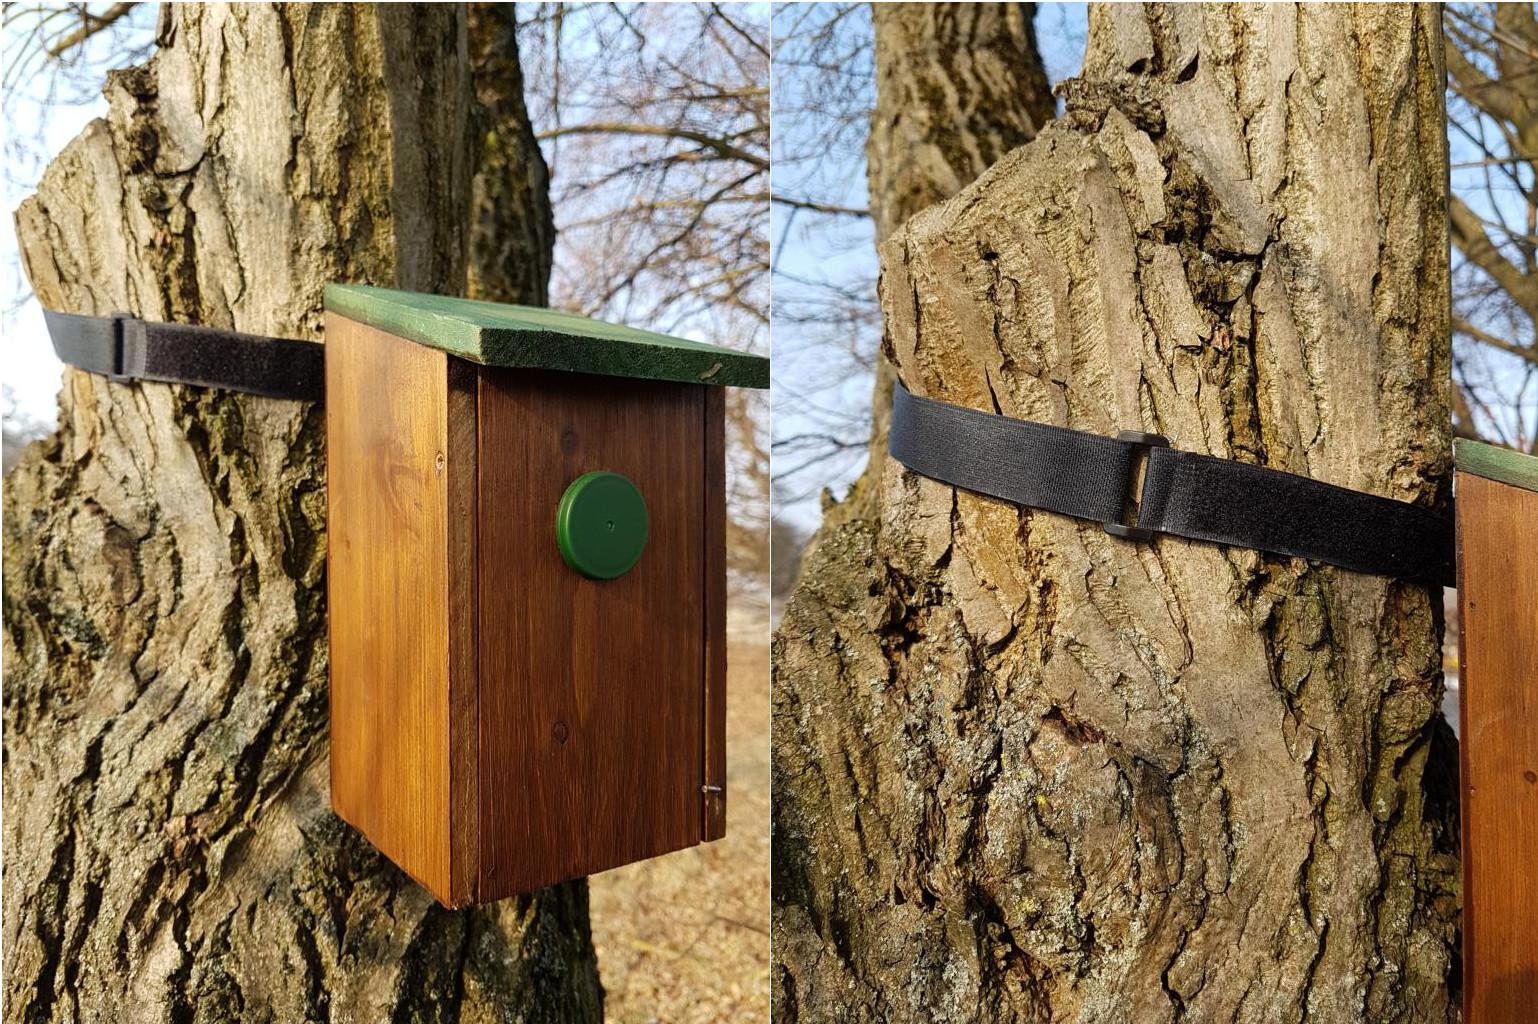 Alternative Cache-Befestigung am Baum